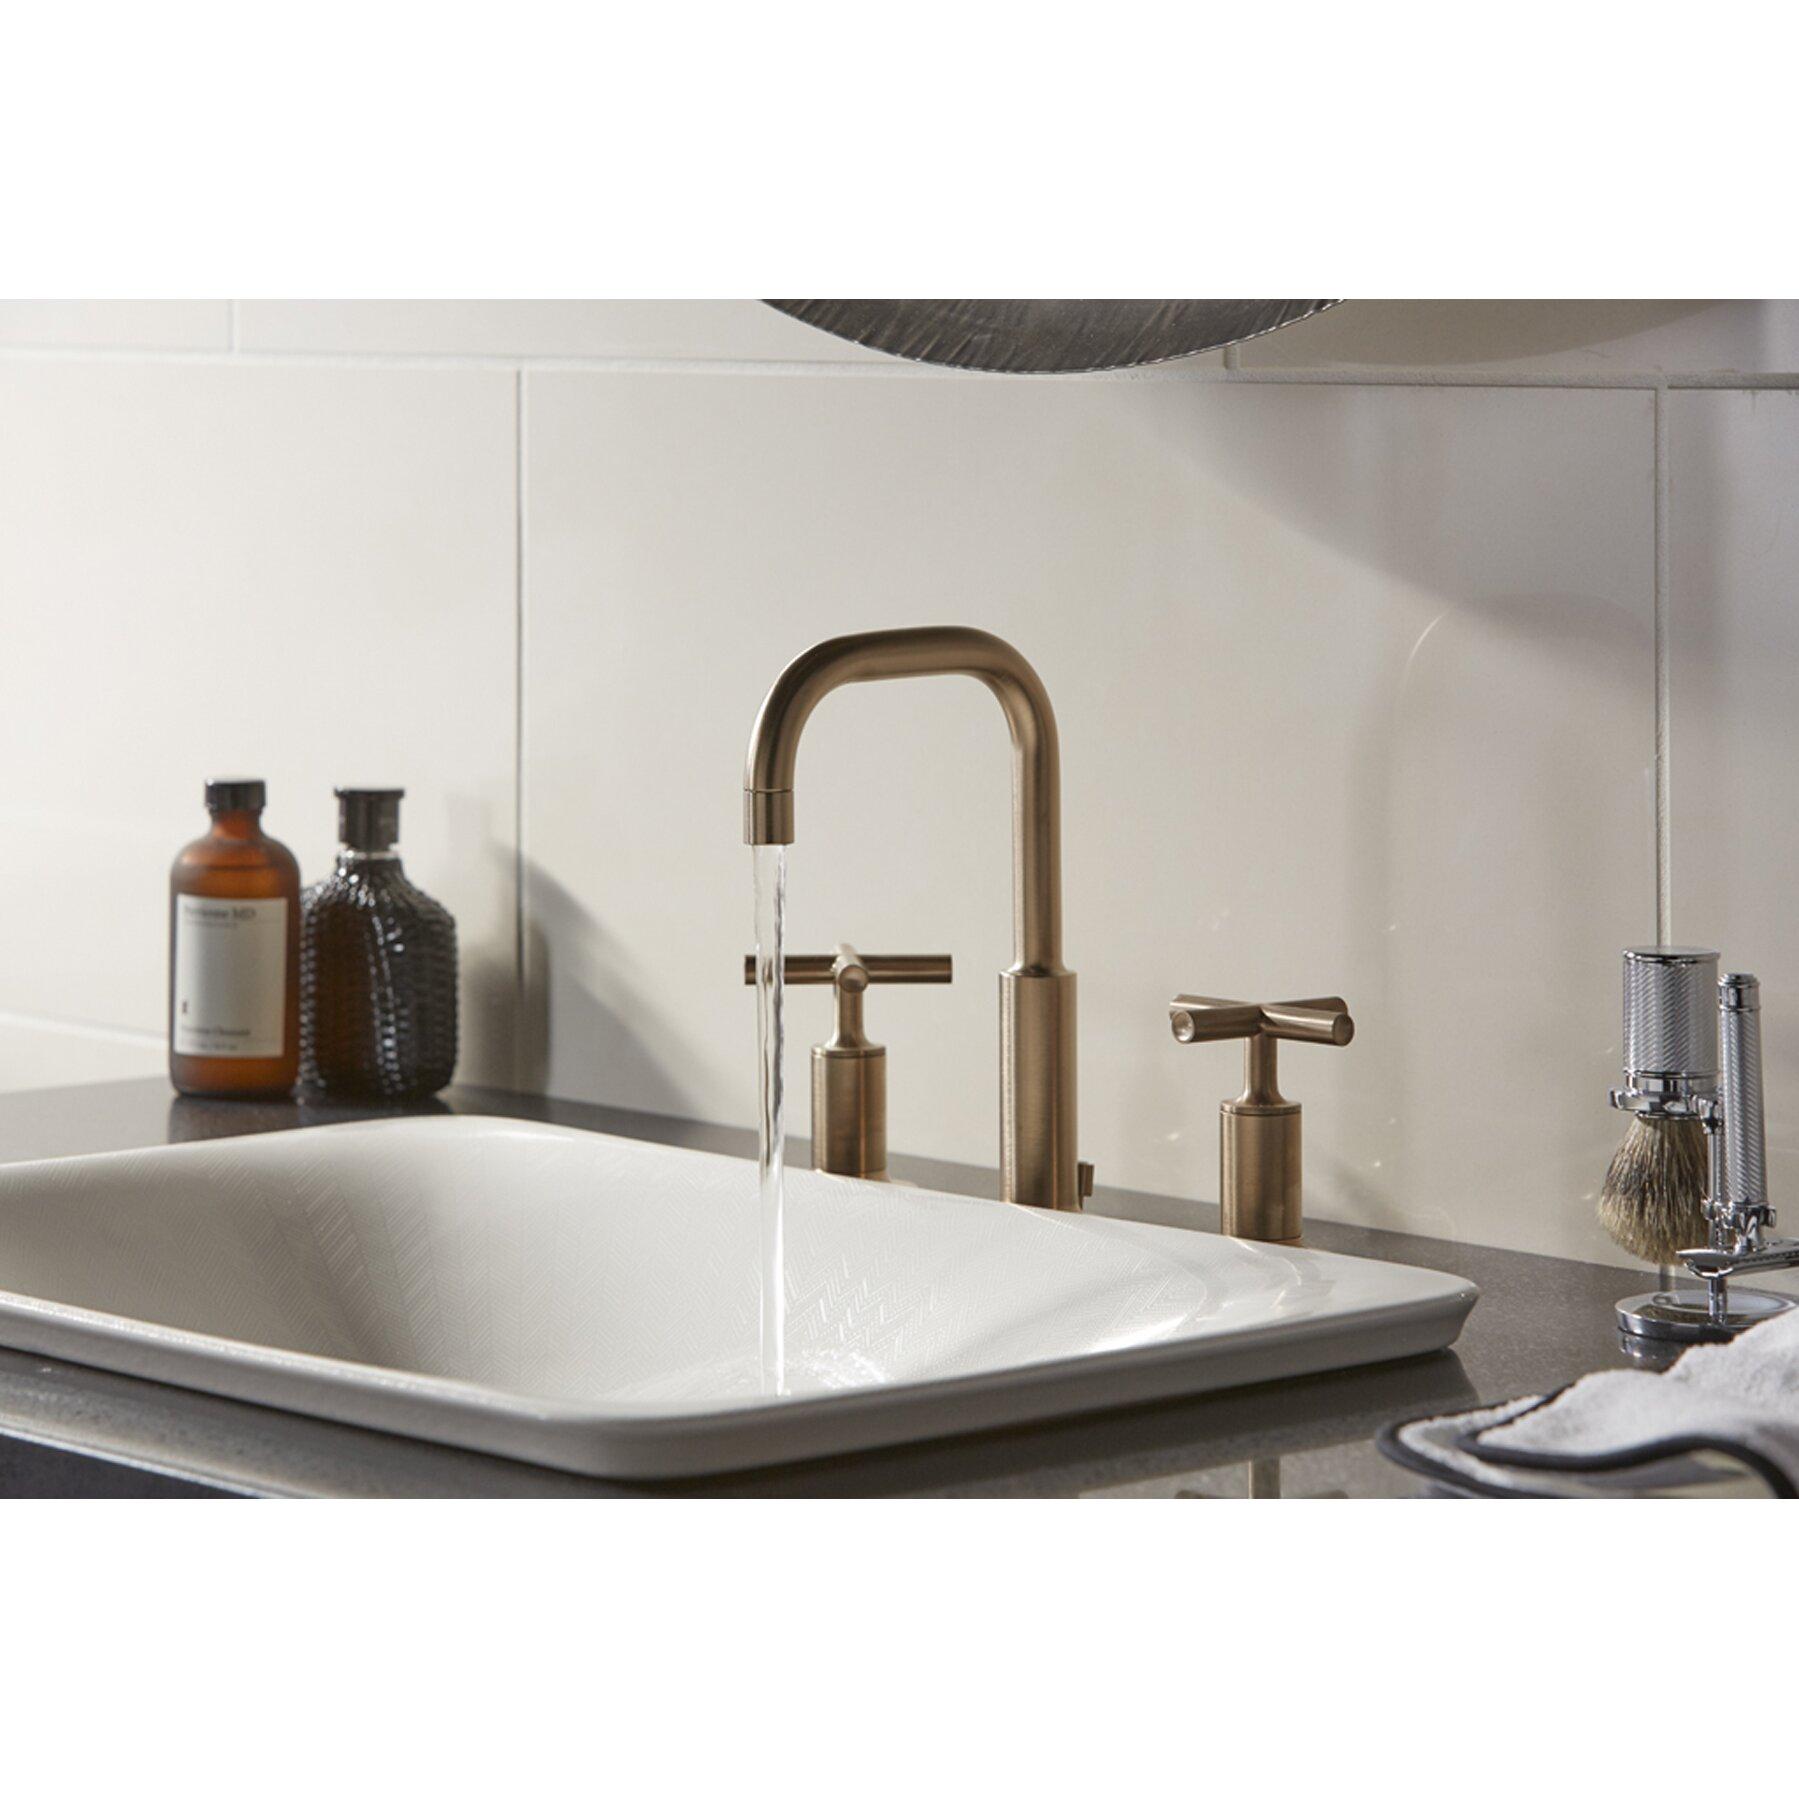 KOHLER Vox White Vessel Rectangular Bathroom Sink with Overflow